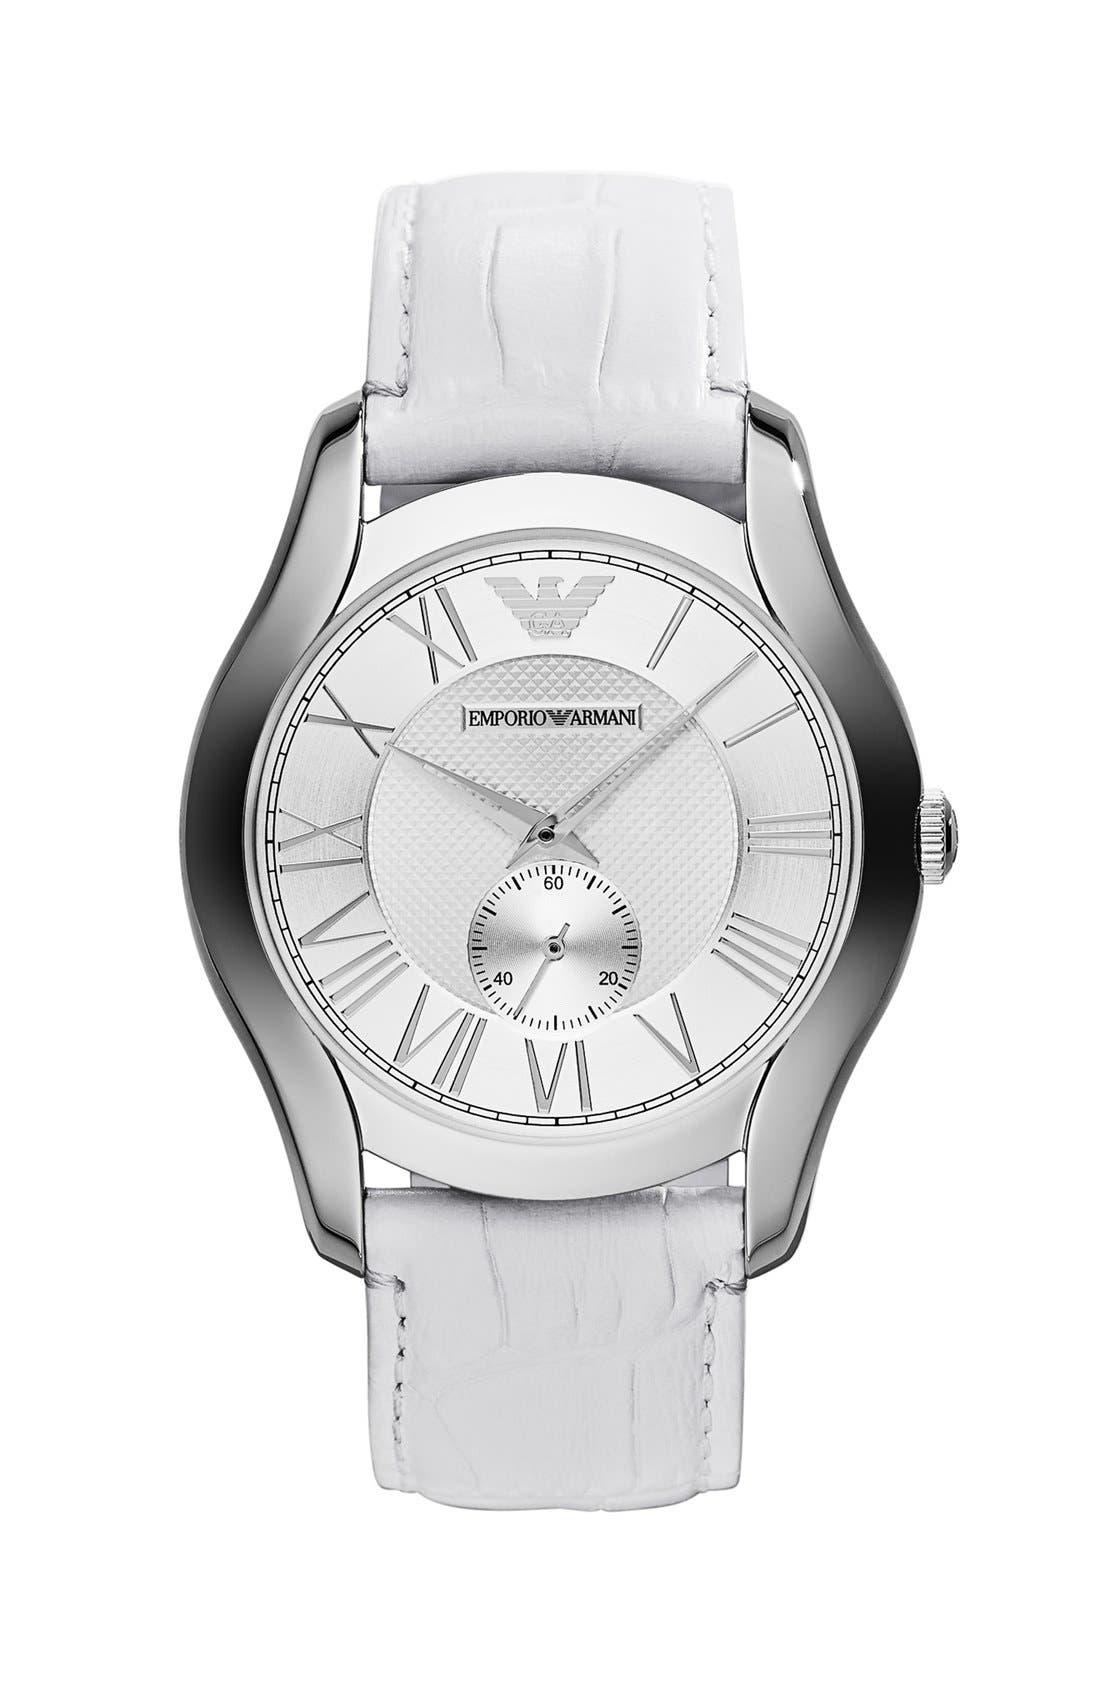 Main Image - Emporio Armani Round Leather Strap Watch, 43mm